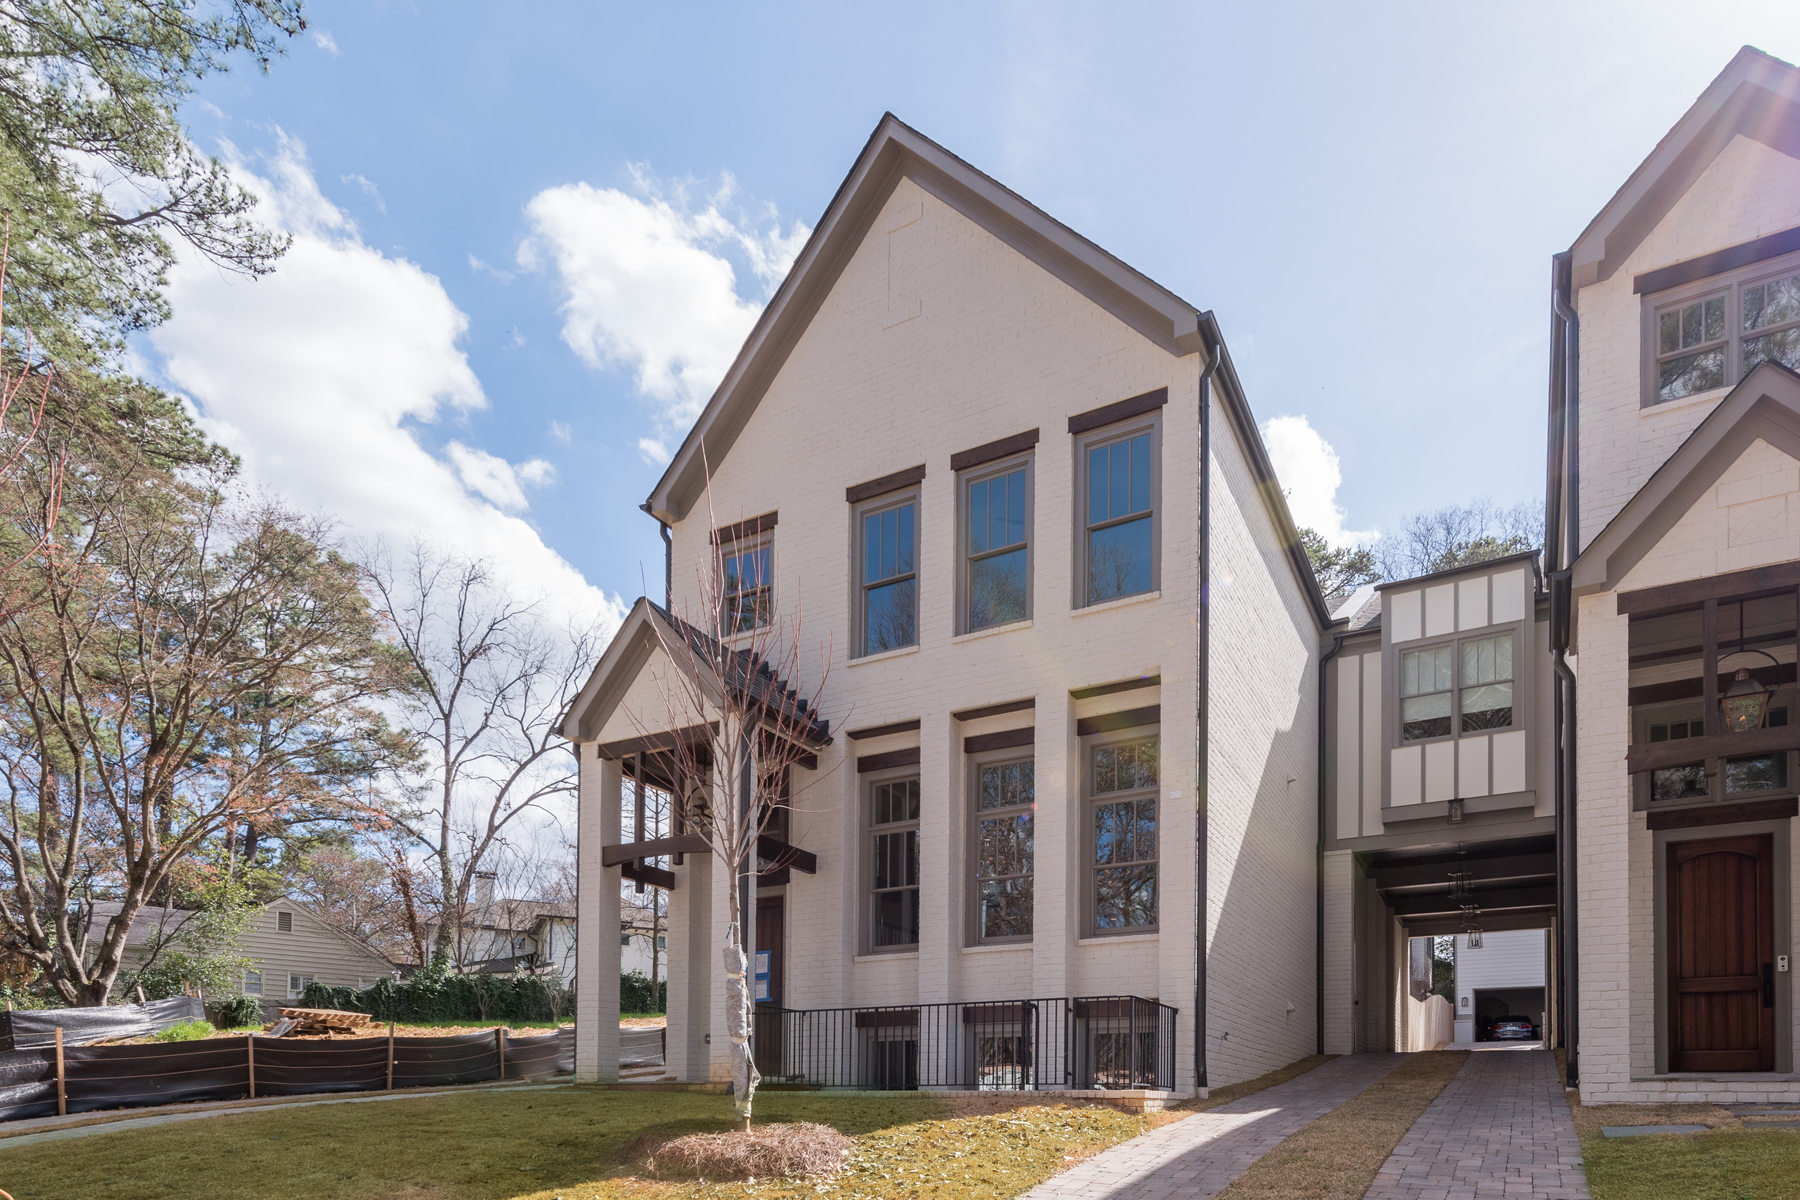 Moradia para Venda às Custom Built Courtyard Home In Buckhead 677 Timm Valley Road NE Peachtree Park, Atlanta, Geórgia, 30305 Estados Unidos